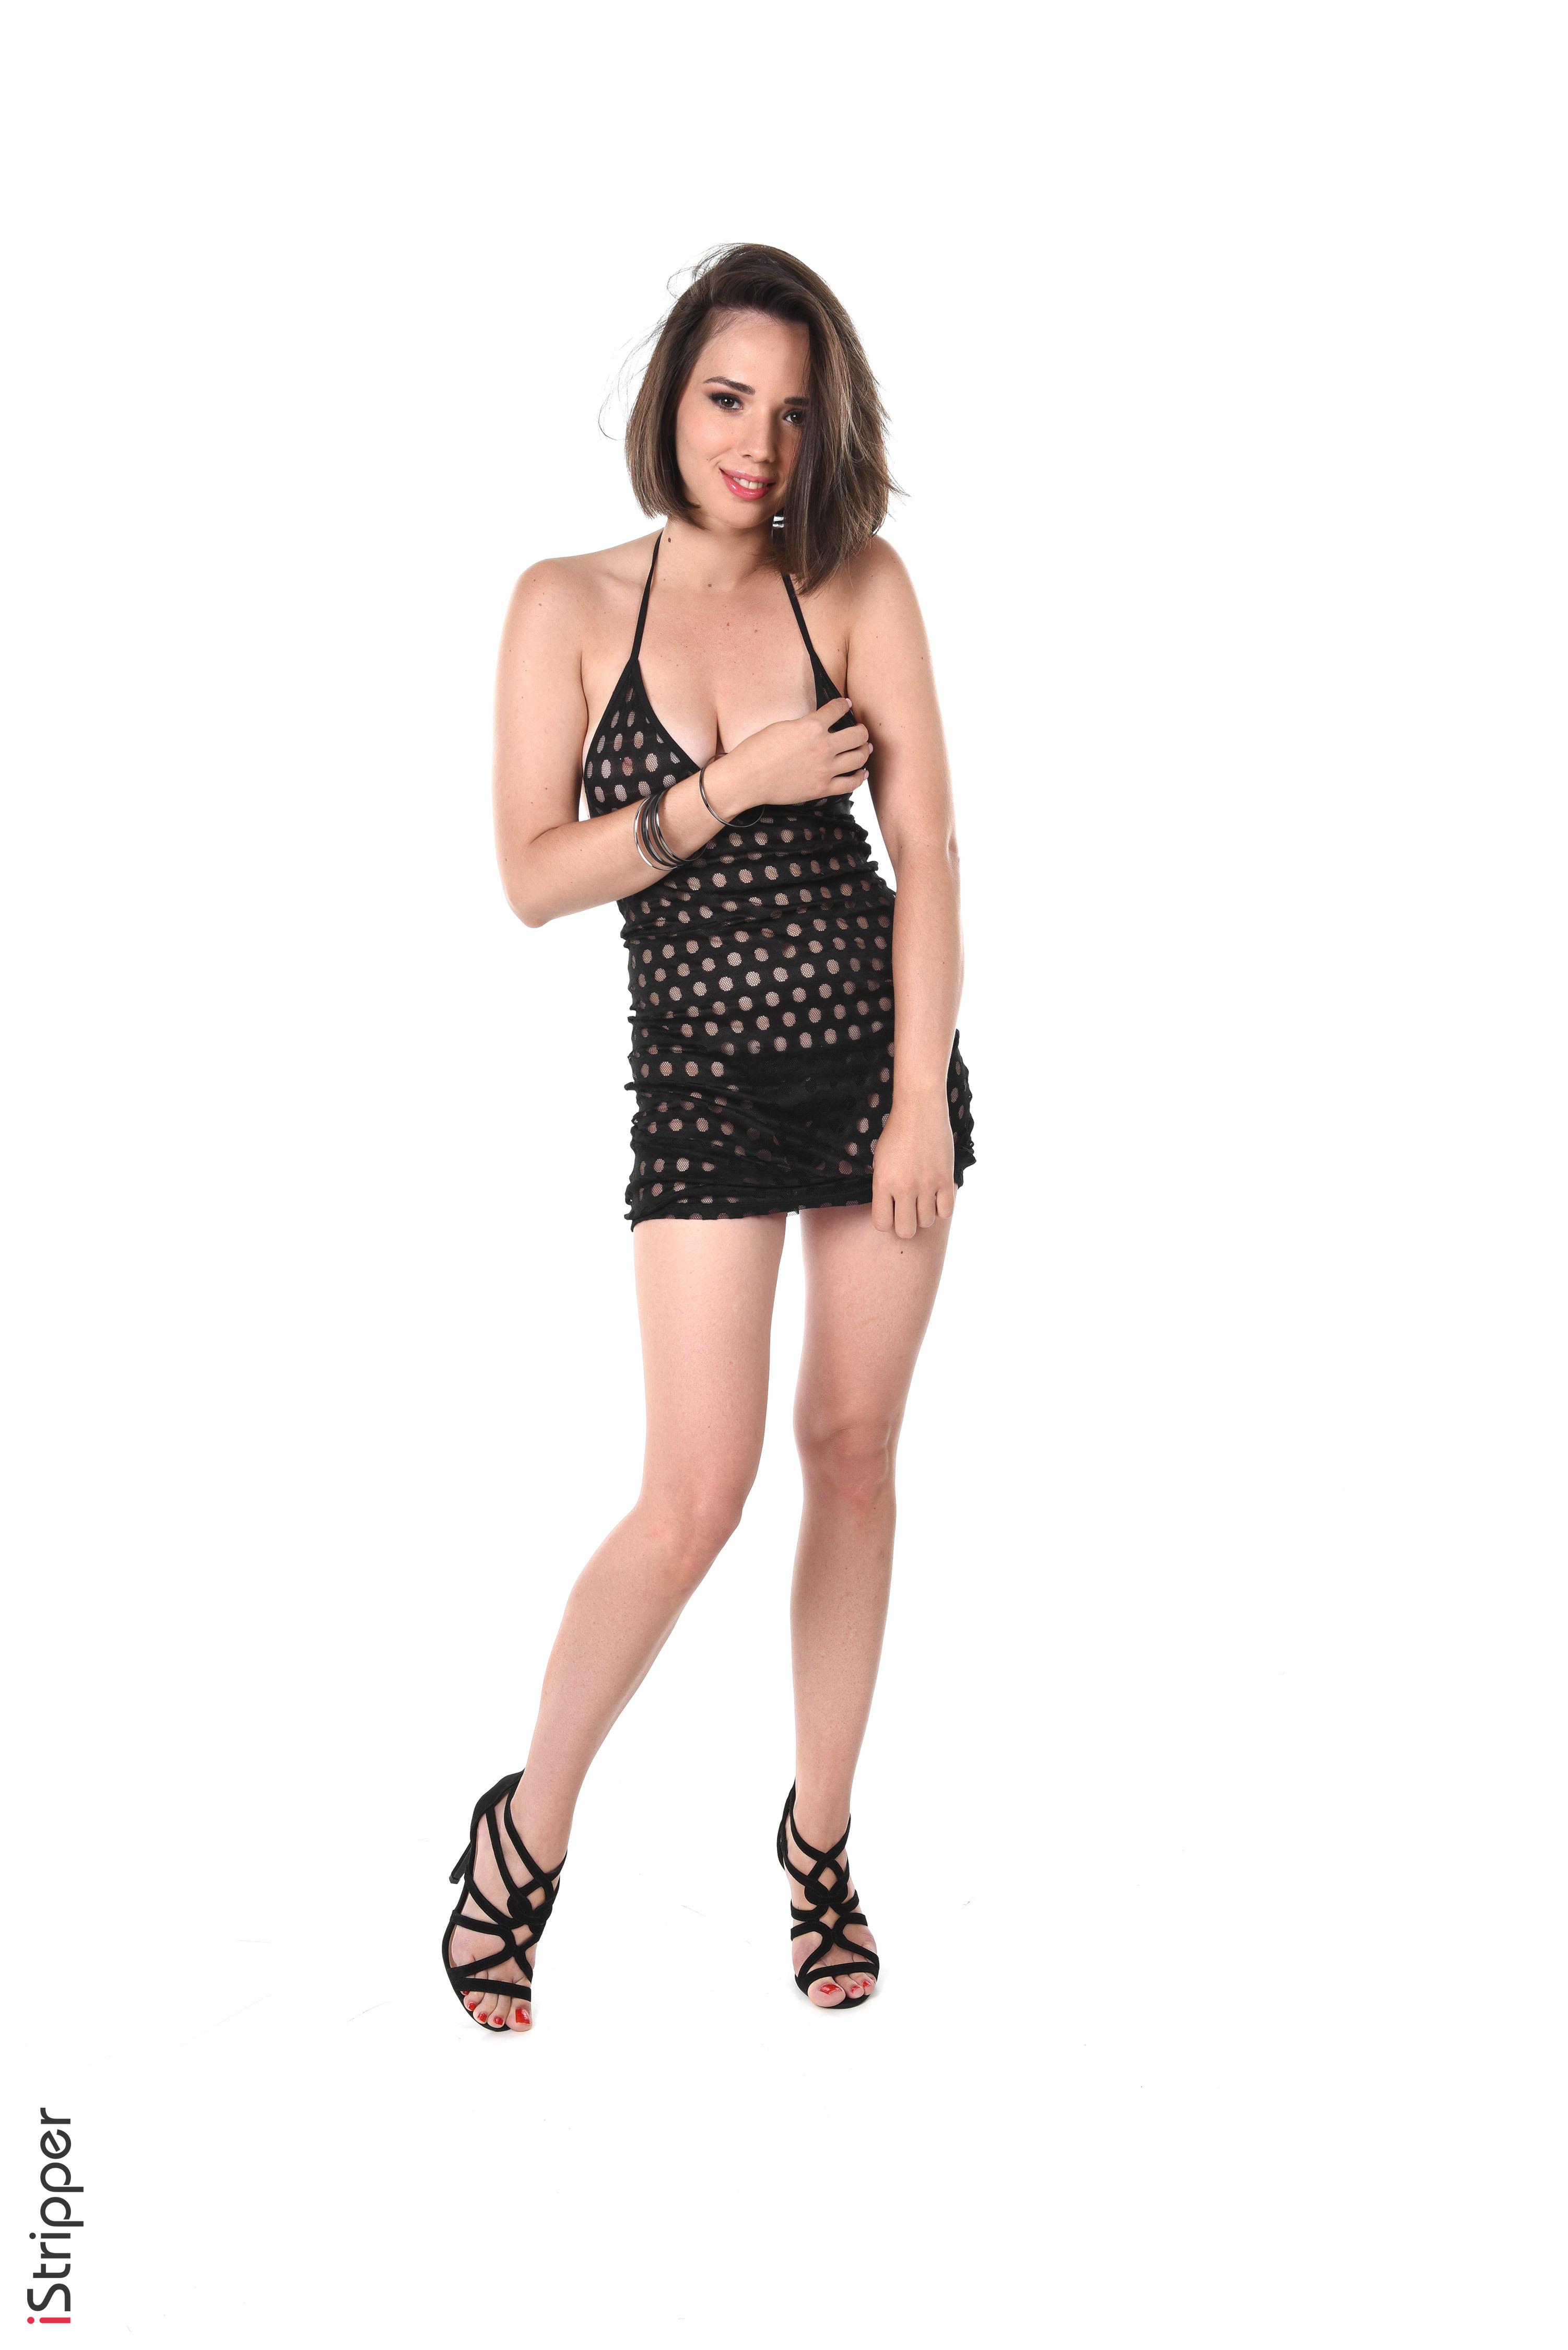 sexy beautiful babe fake boobs striptease xhamster